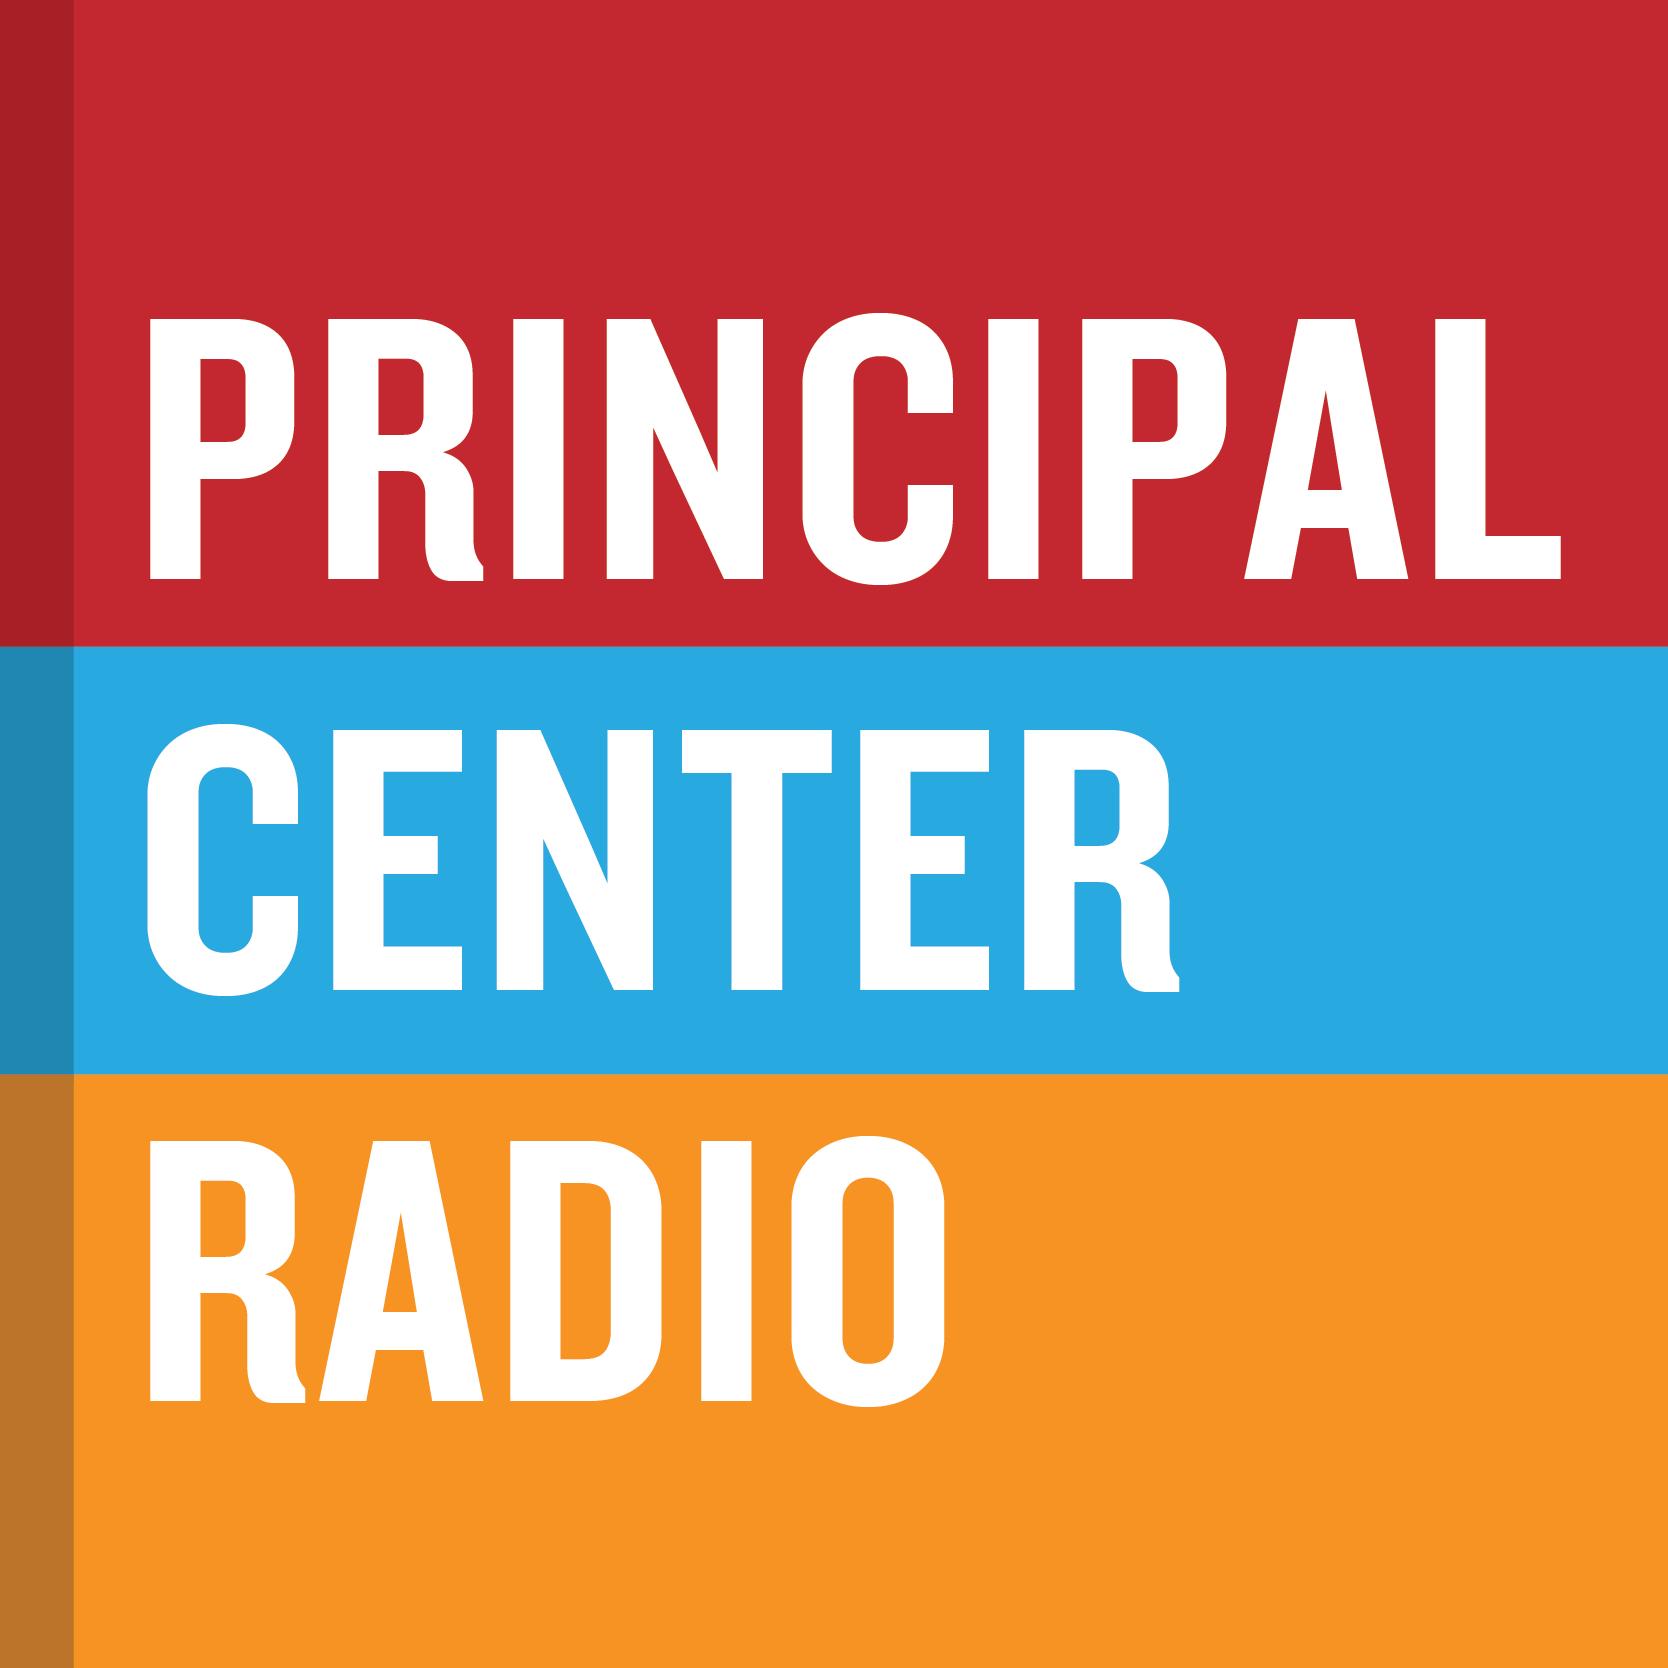 Principal Center Radio